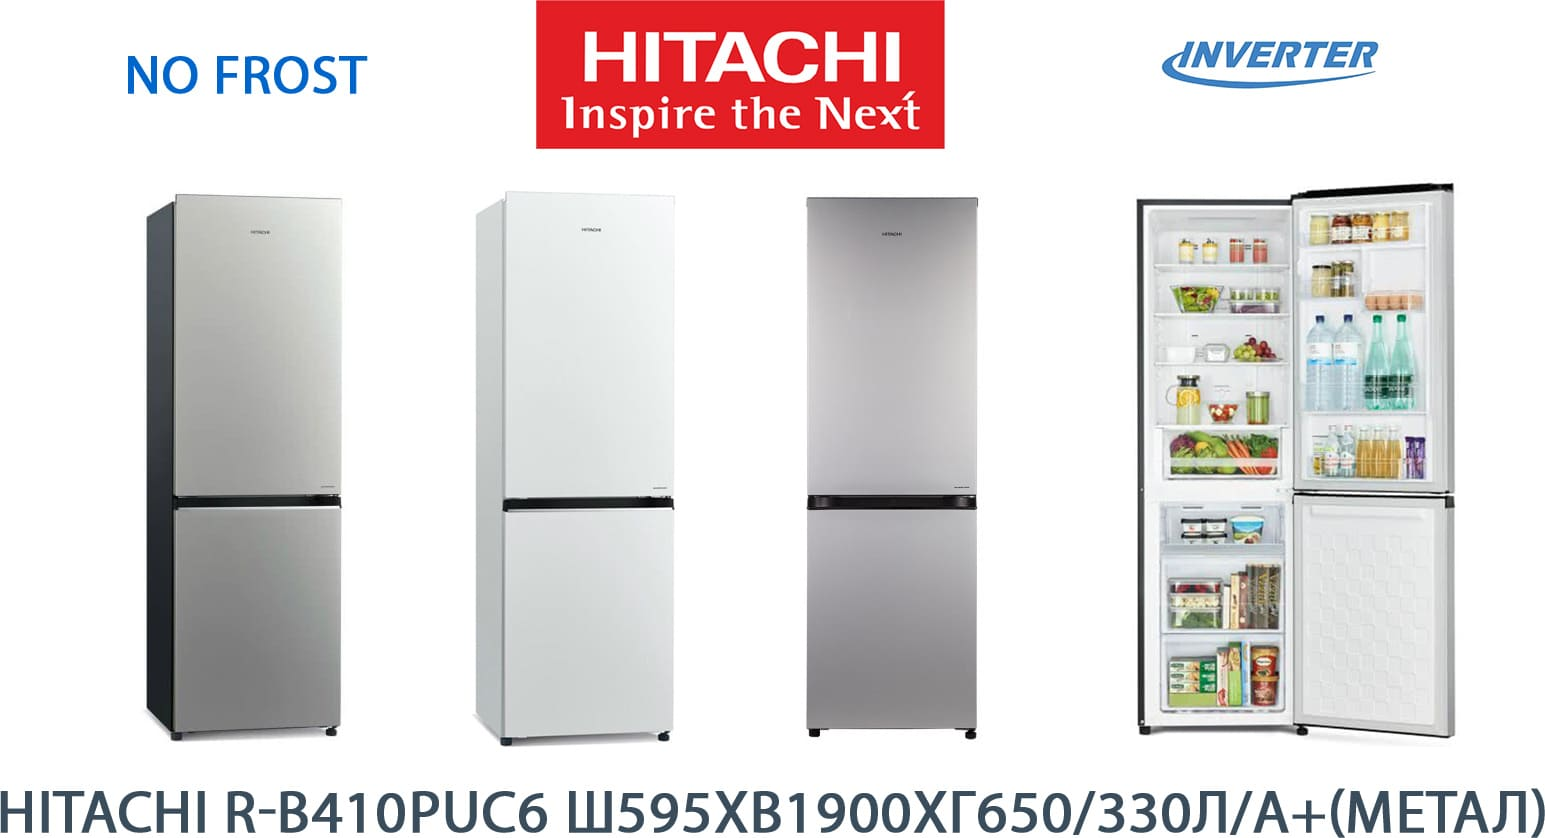 Hitachi_r-B410_vse_cveta Топ бюджетных холодильников